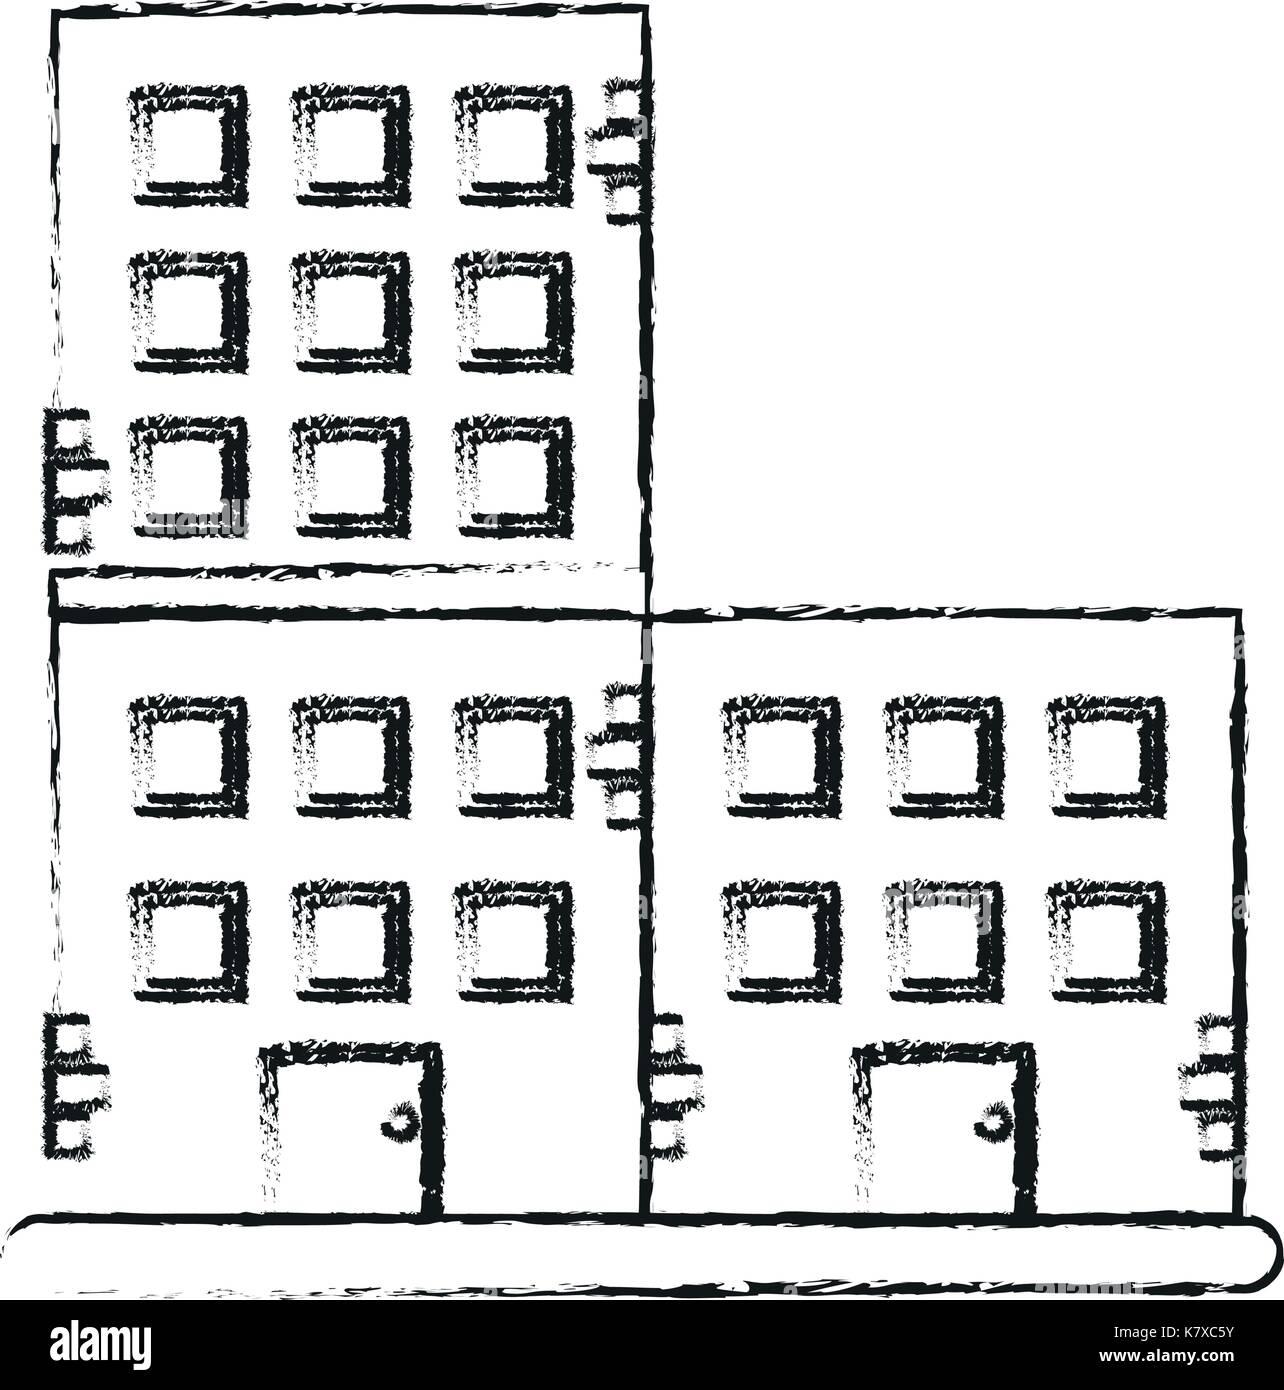 black white image old building stock photos black white image old building stock images alamy. Black Bedroom Furniture Sets. Home Design Ideas